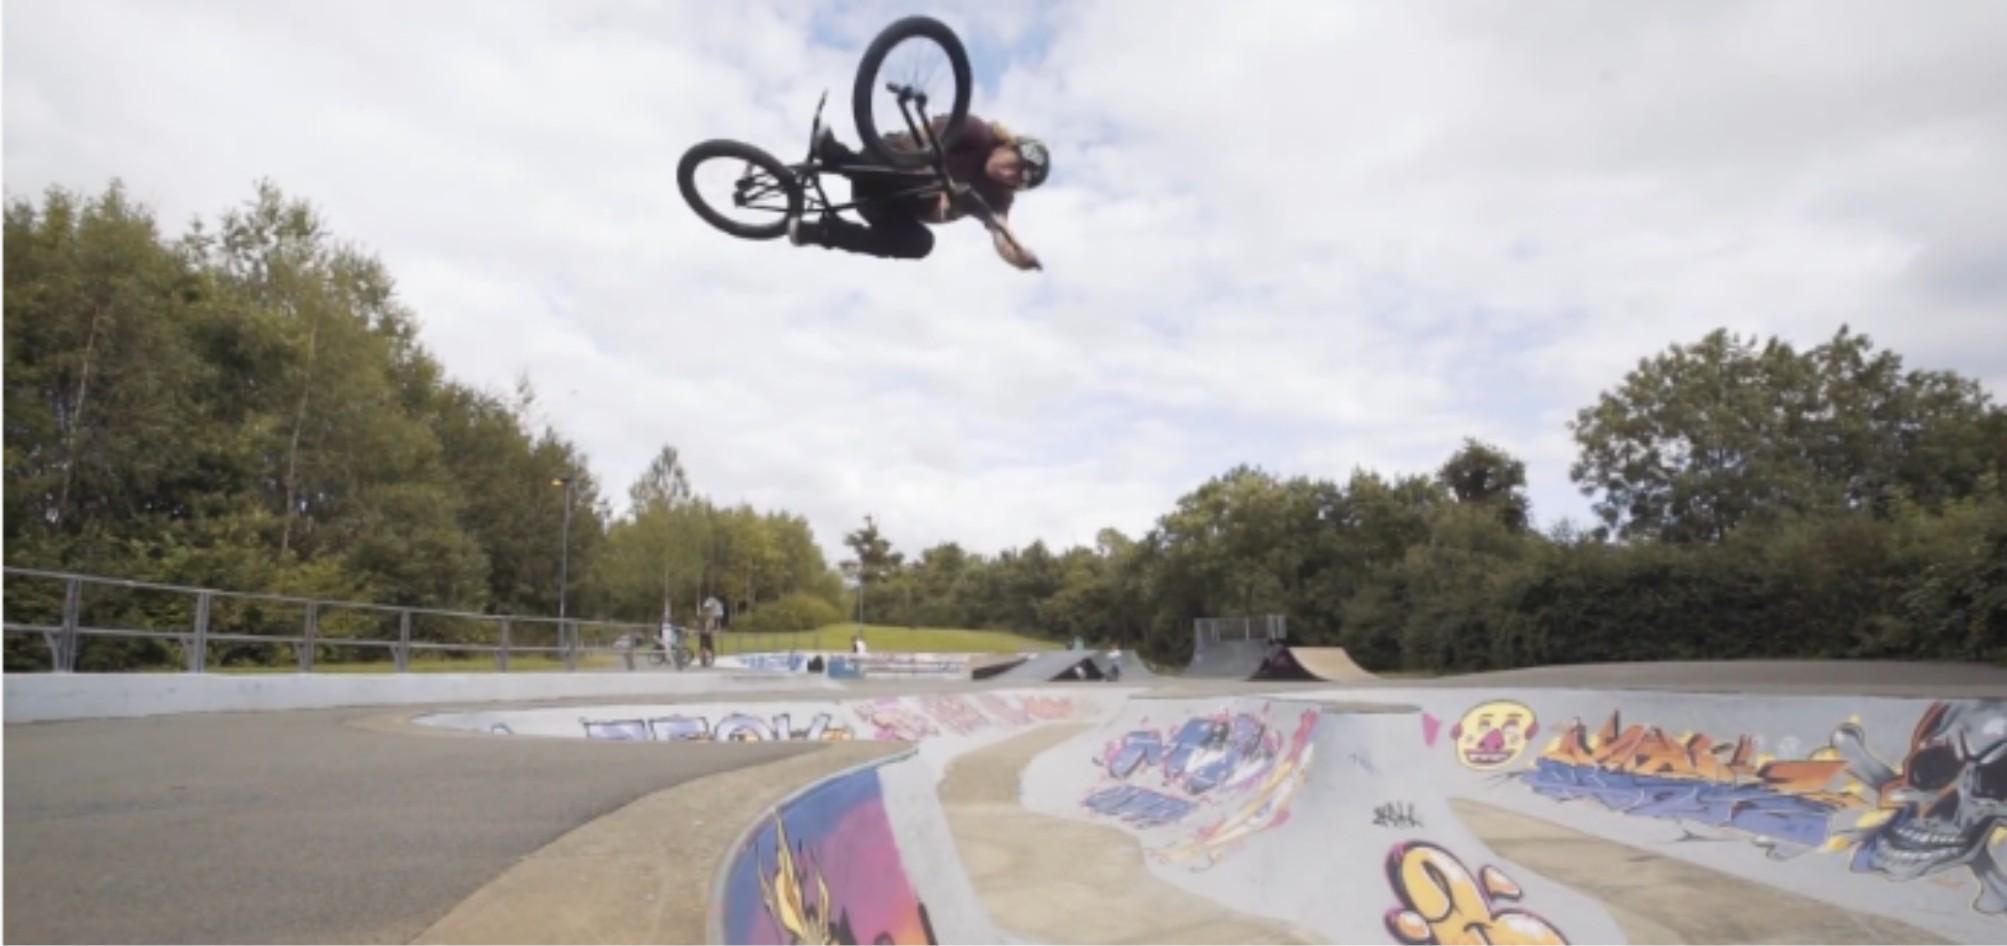 The Greg Illingworth Bell Helmets welcom to the team BMX video